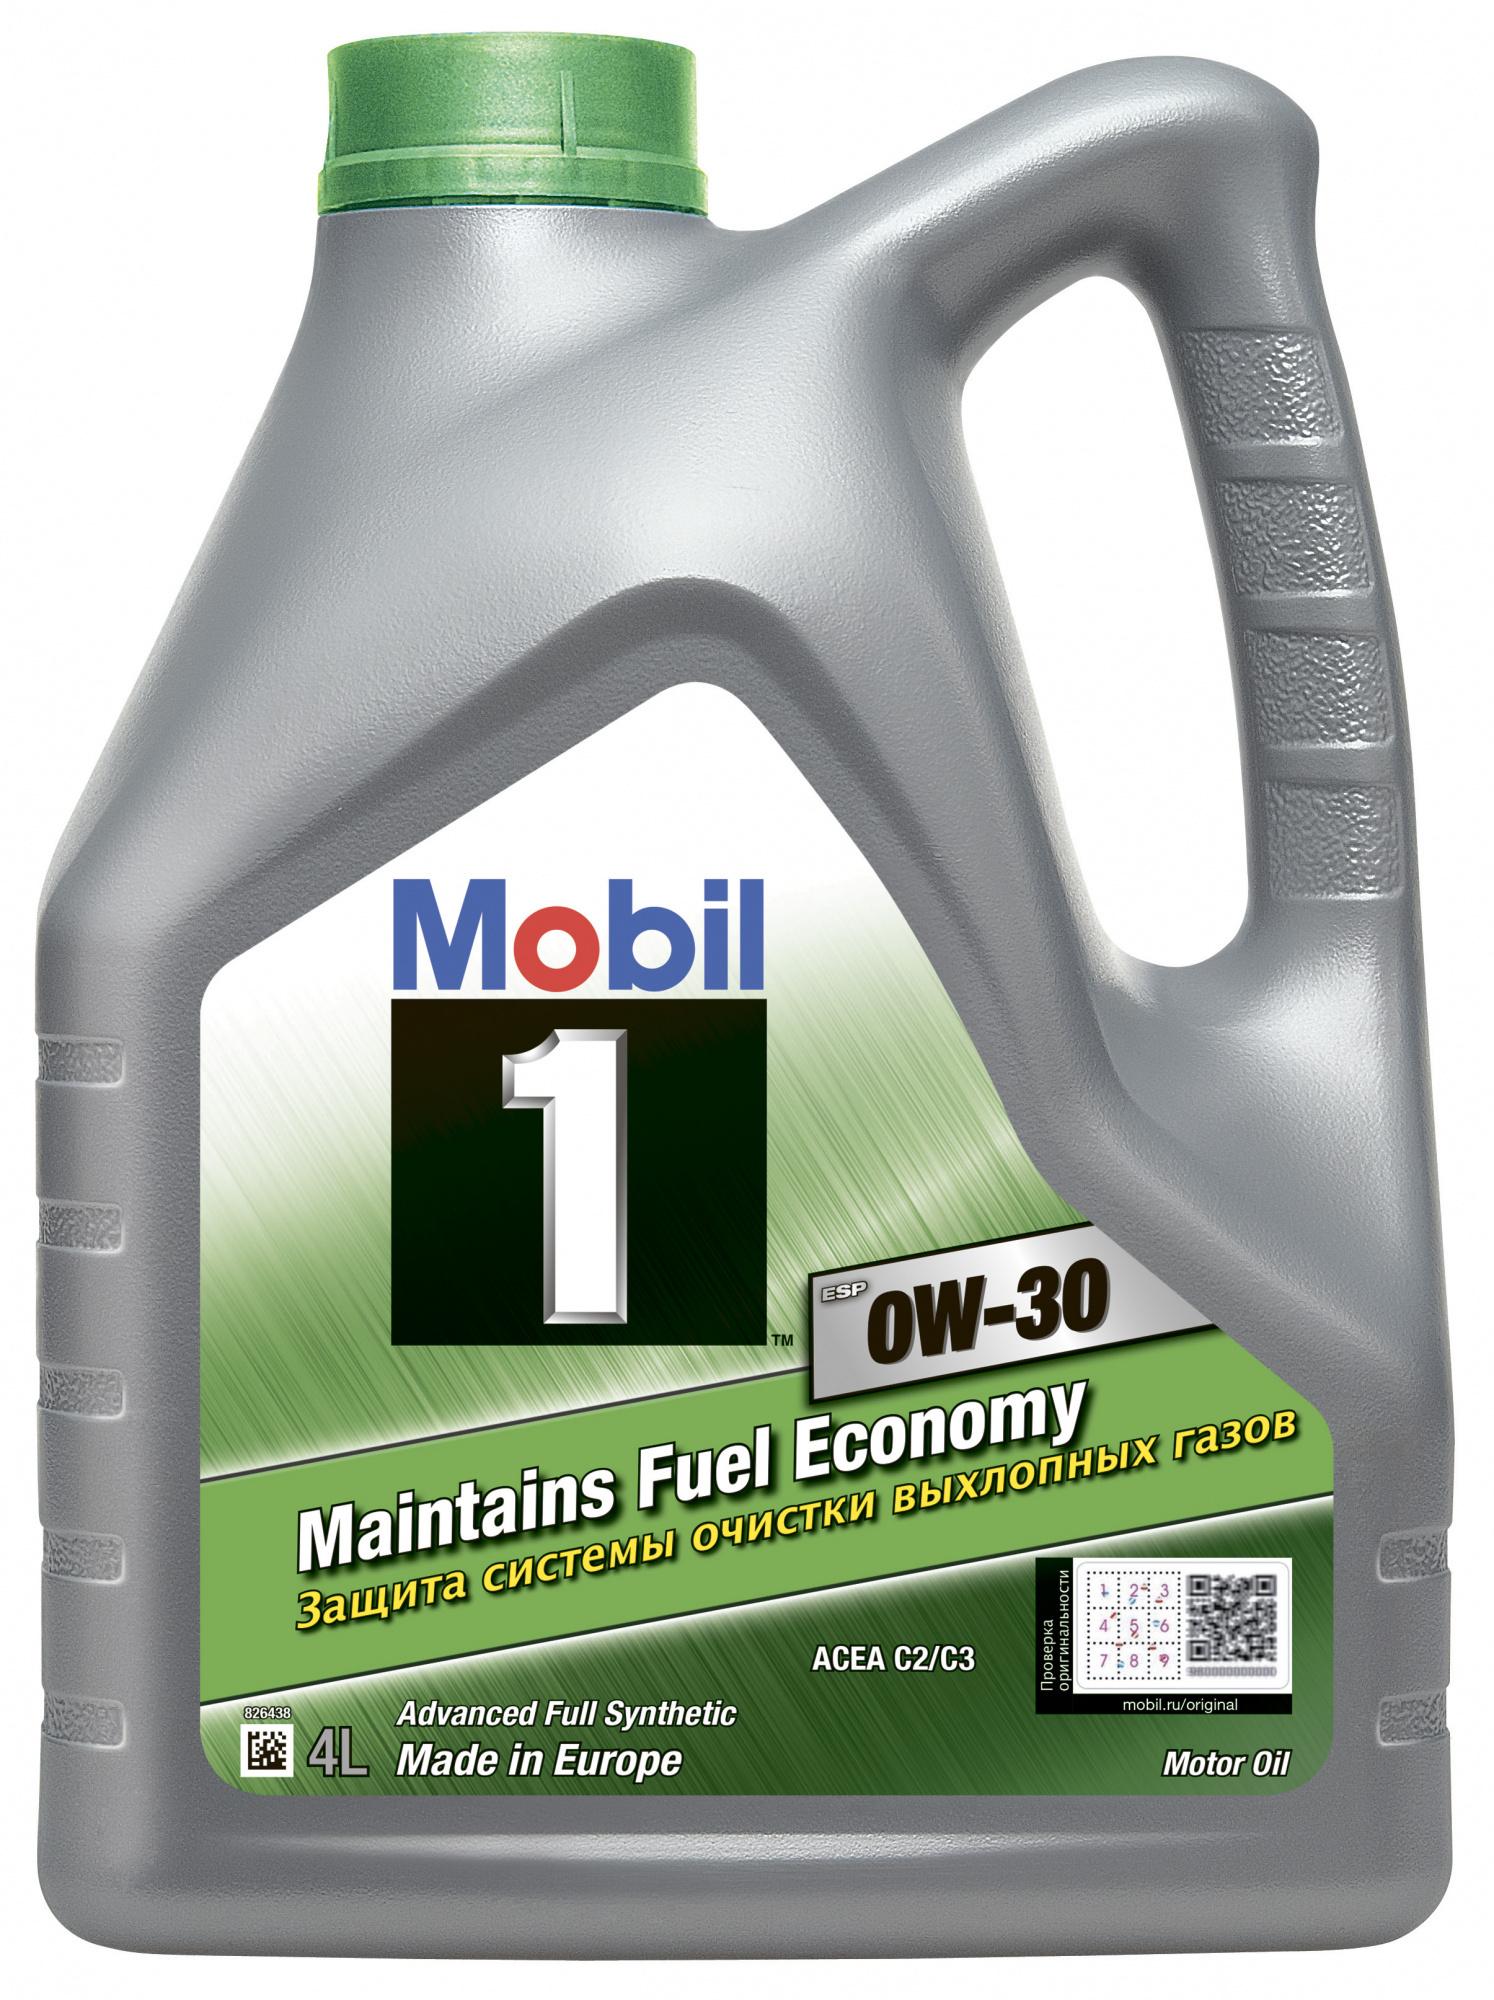 Mobil 1 ESP 0W30 Синтетическое моторное масло